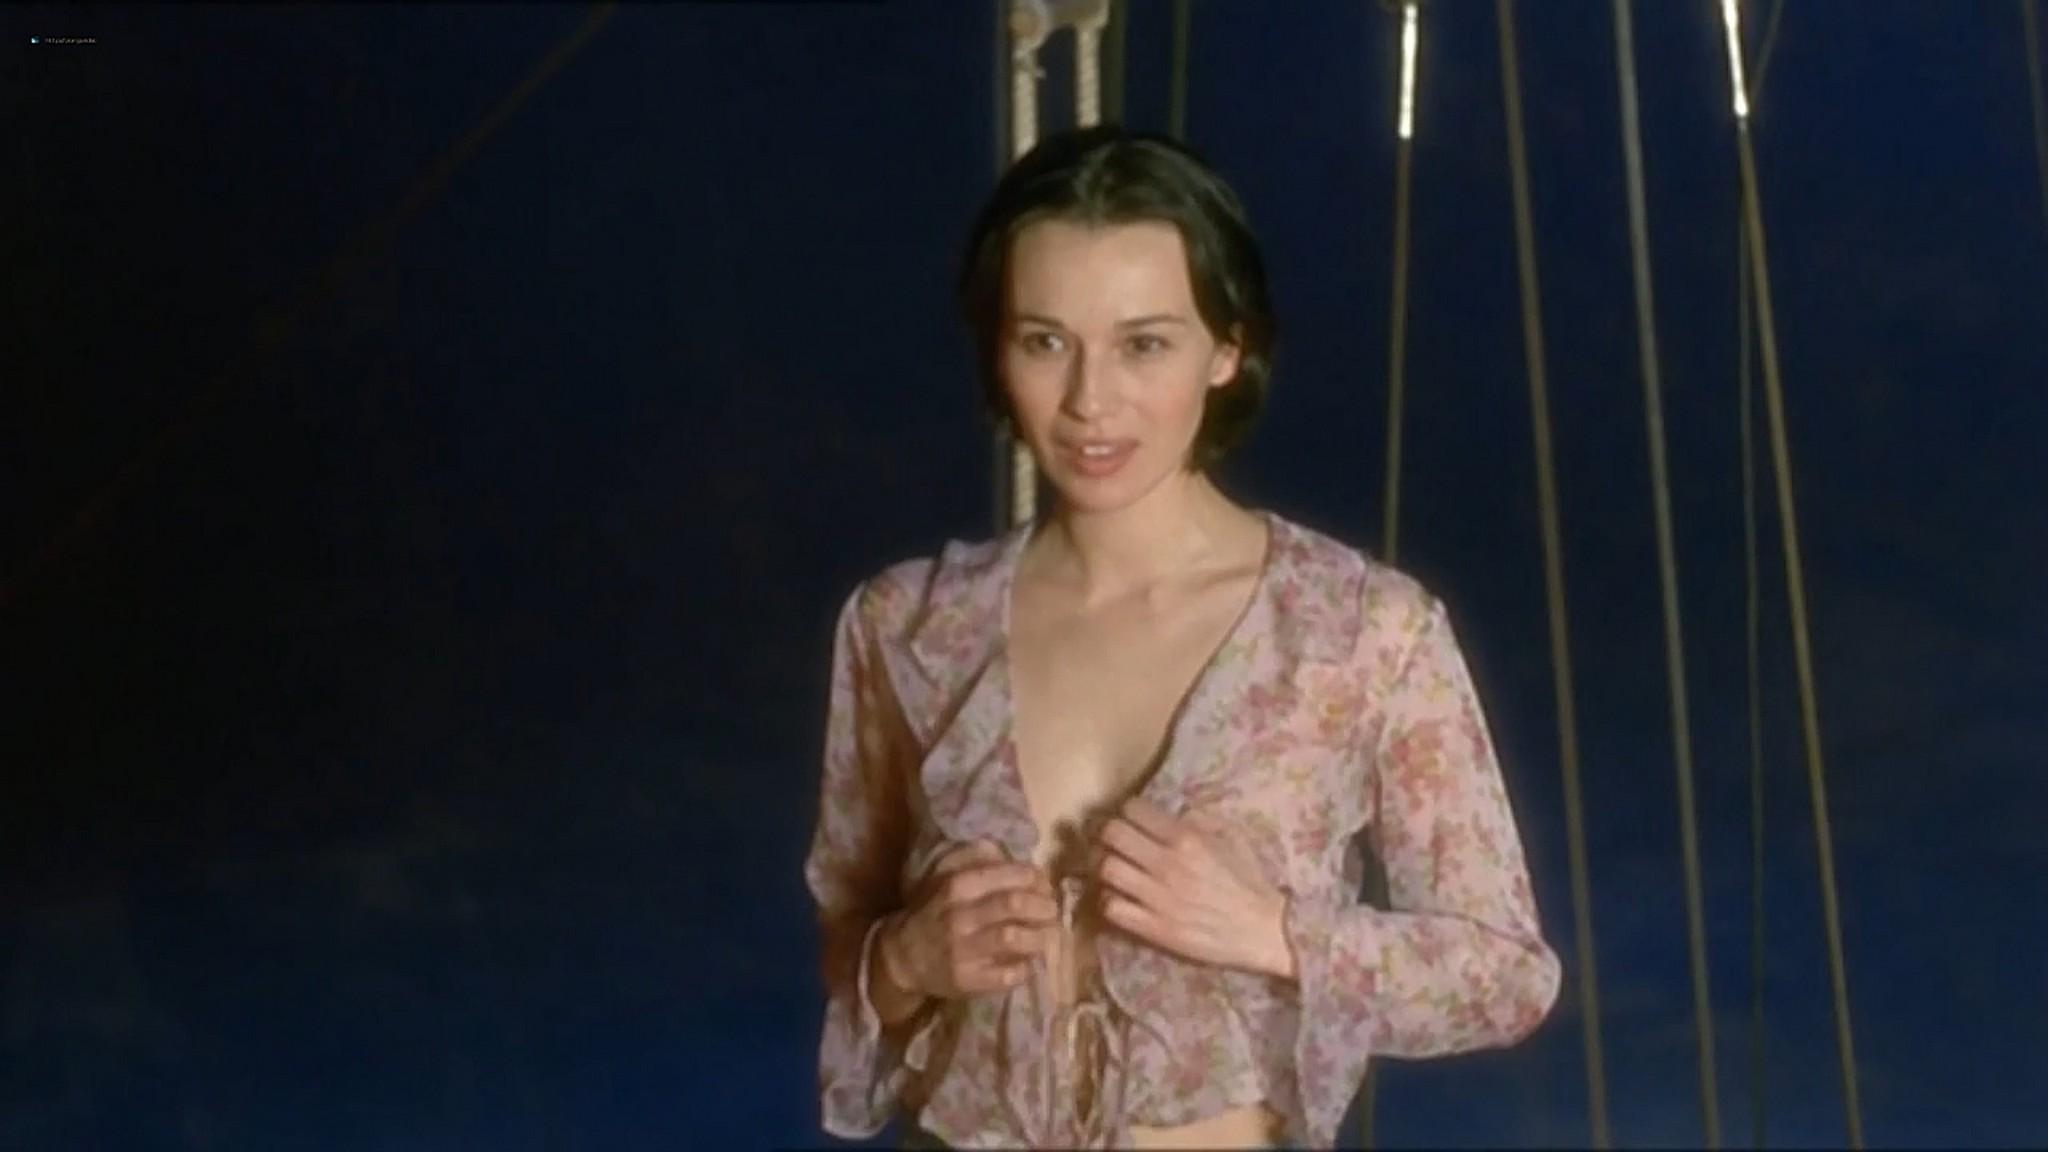 Ariadna Gil nude sex Sandra Ballesteros and other nude and sex El lado oscuro del corazon 2 AR 2001 720p 13